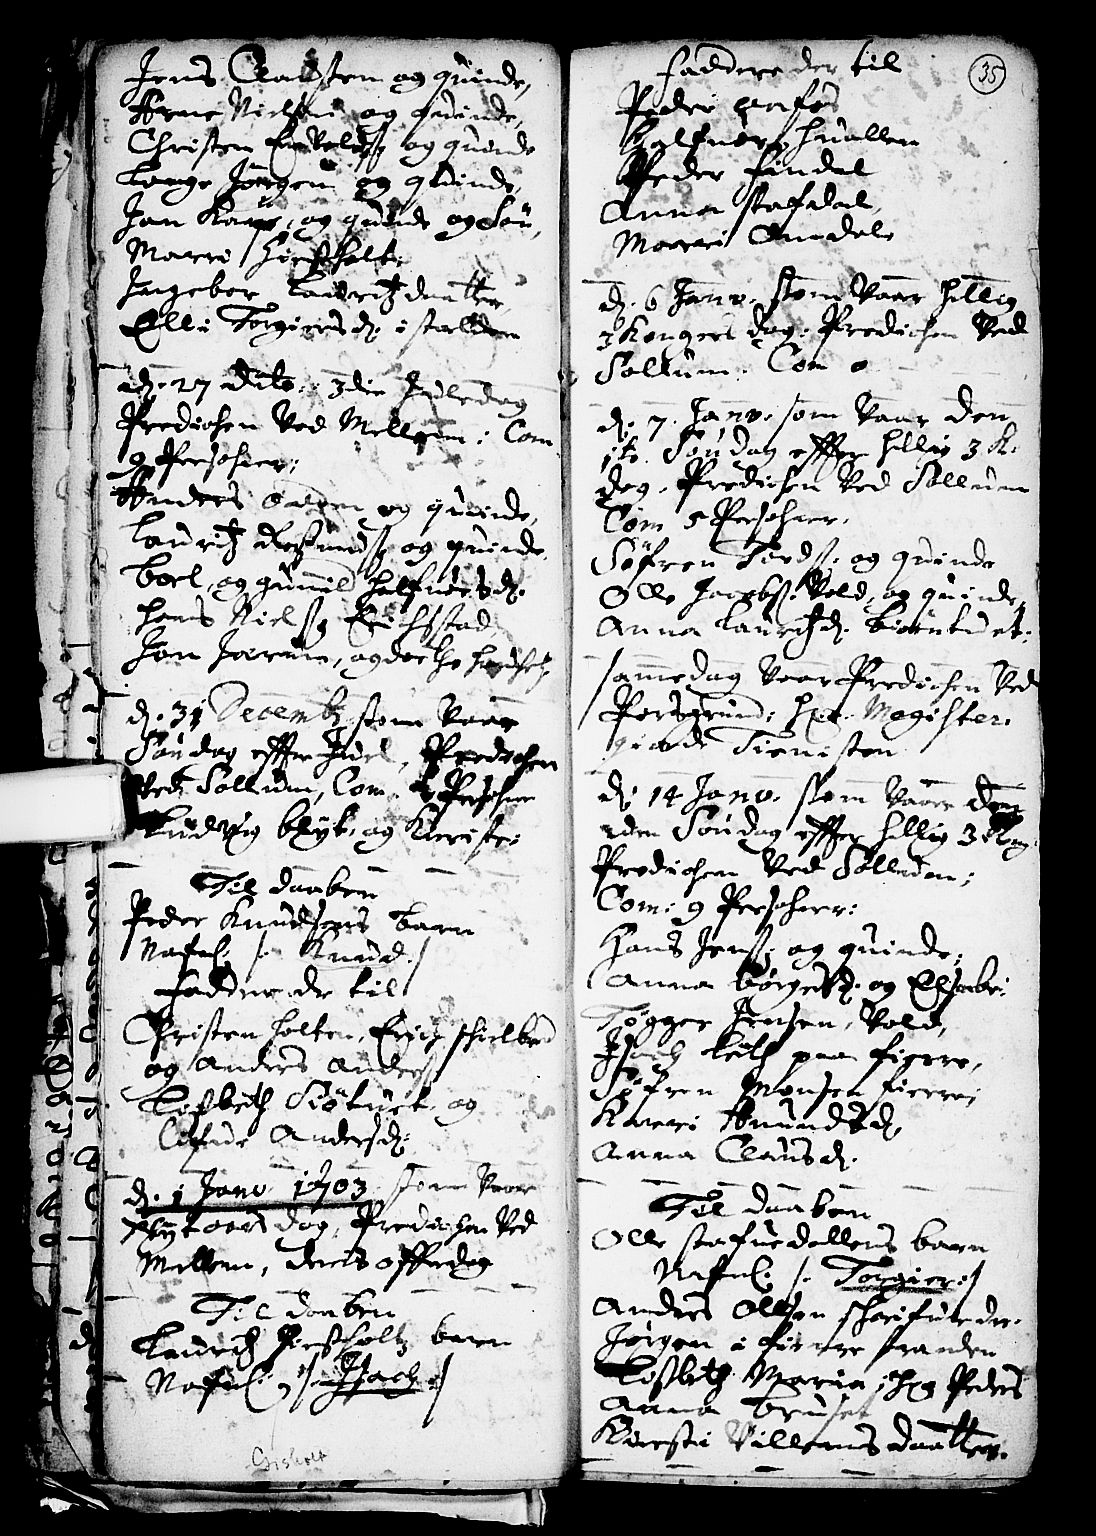 SAKO, Solum kirkebøker, F/Fa/L0001: Ministerialbok nr. I 1, 1701-1716, s. 35